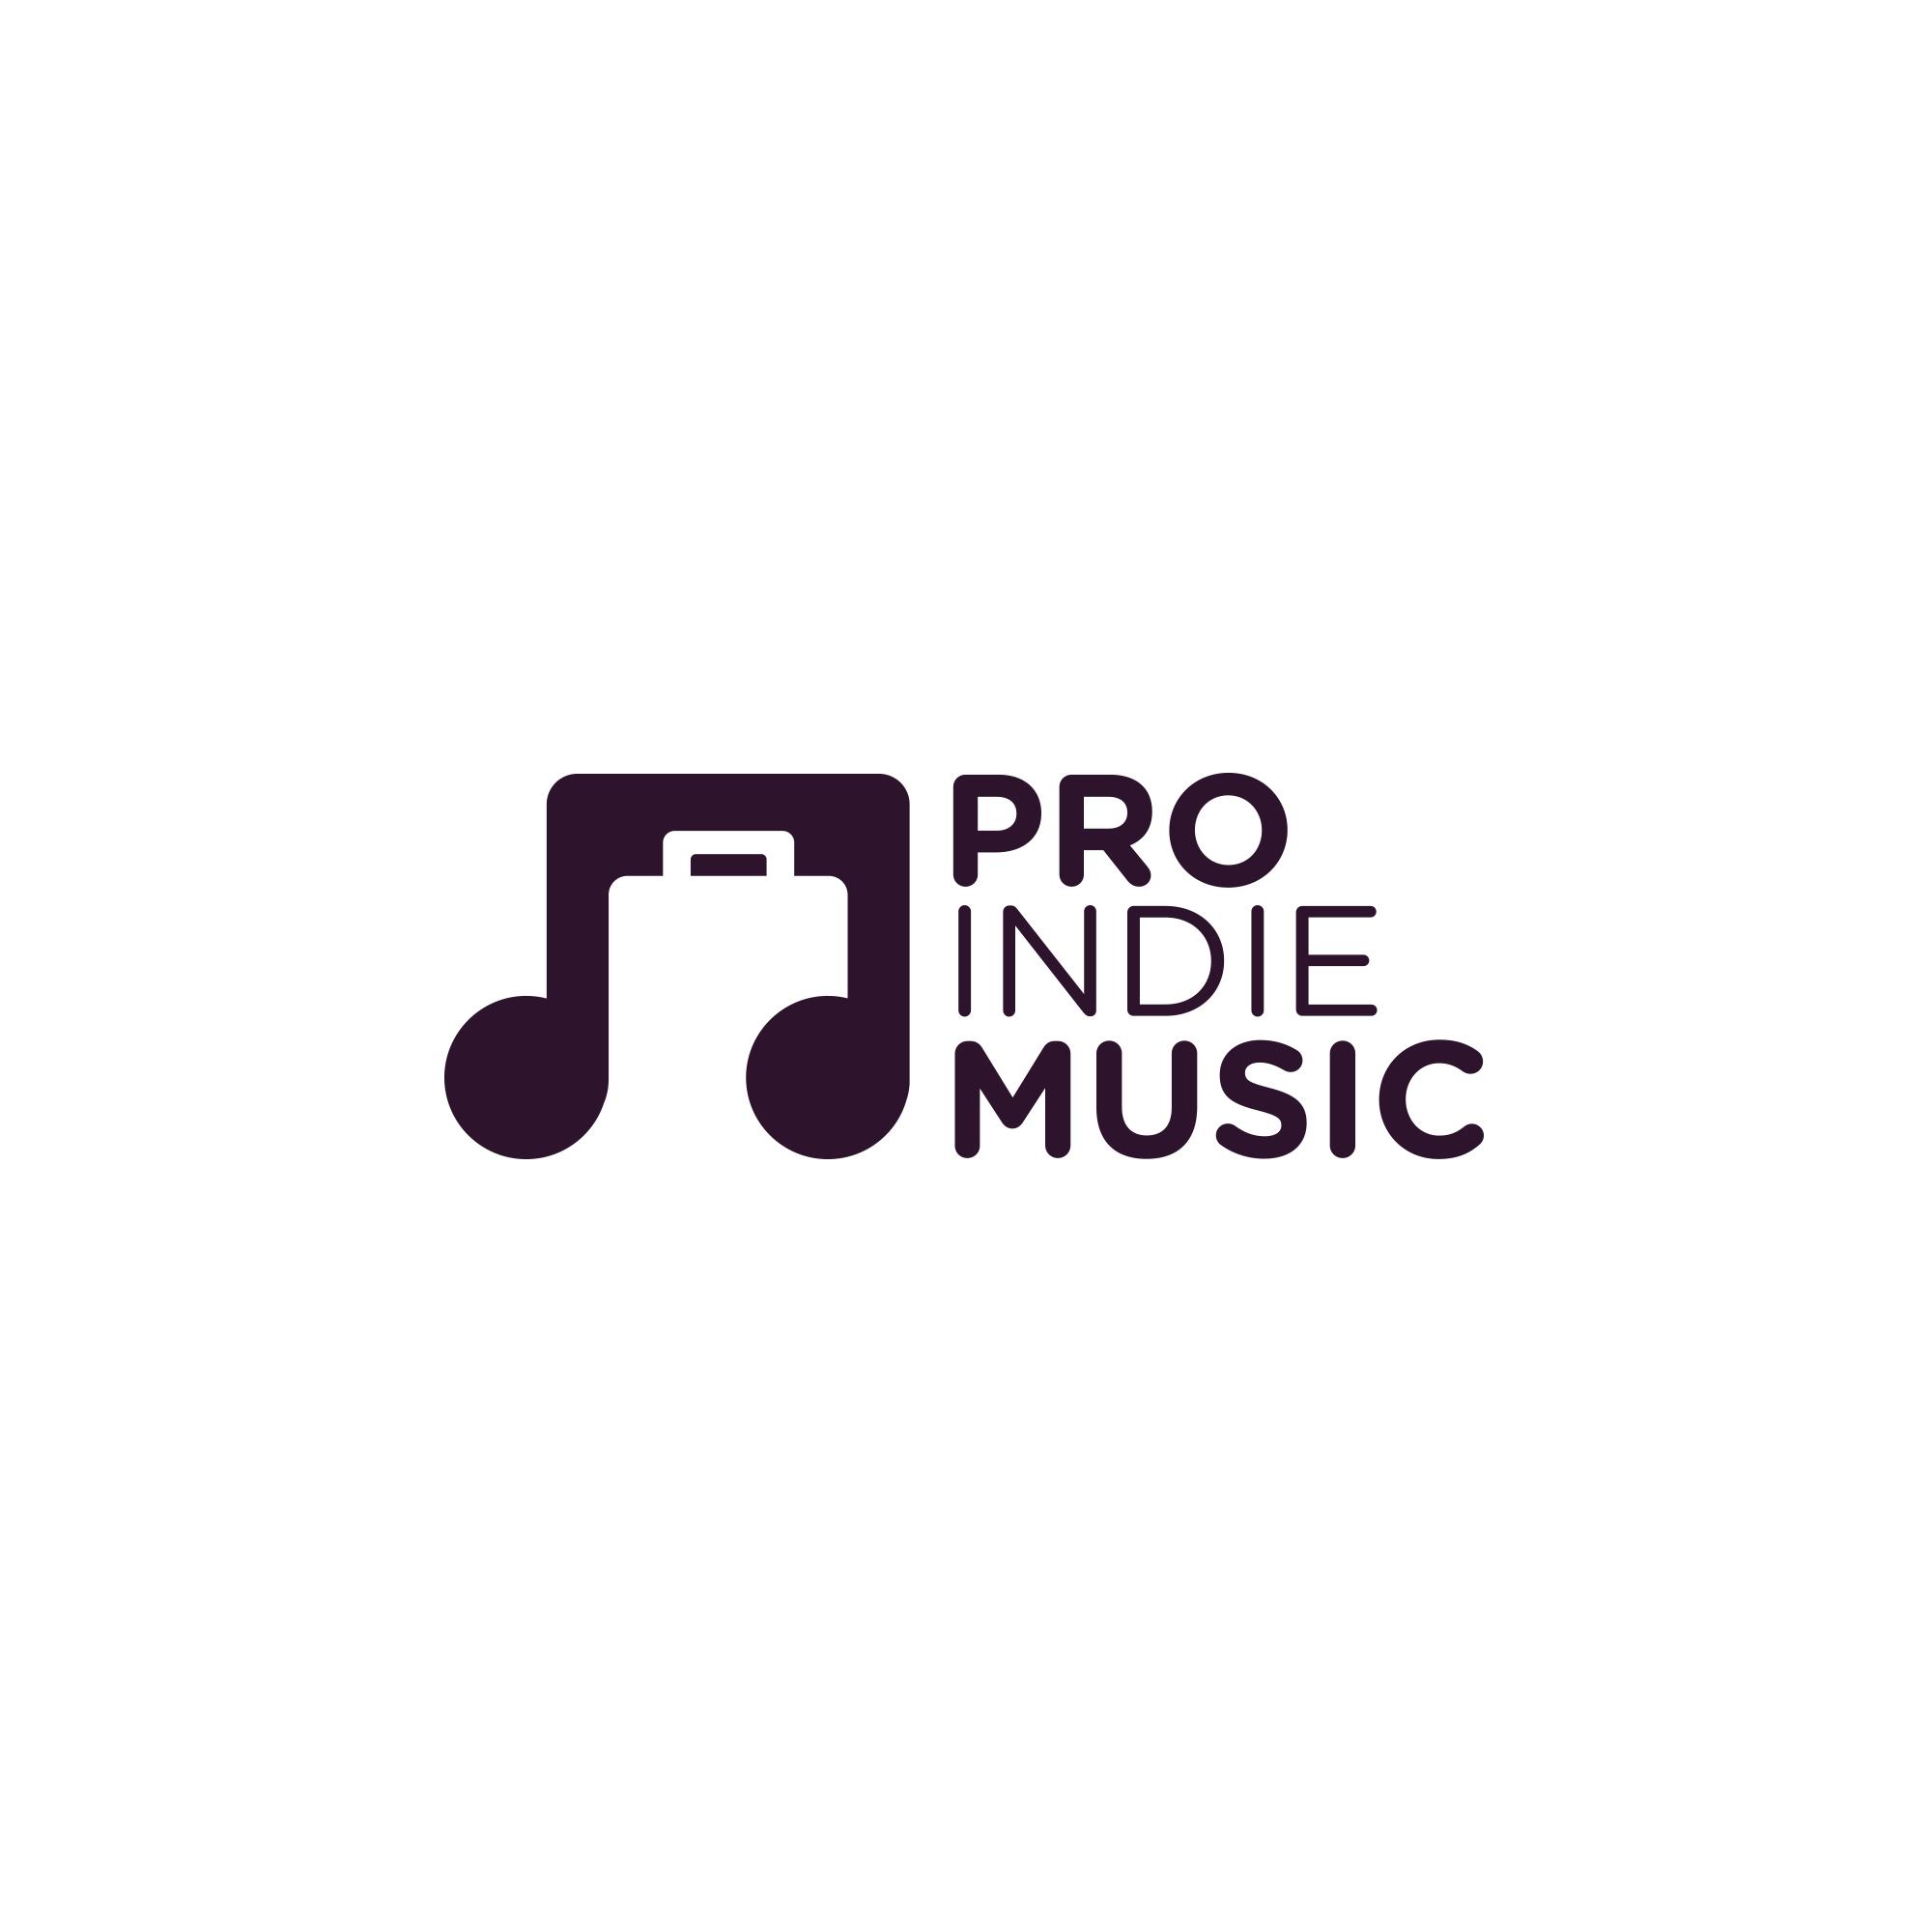 Pro Indie Music